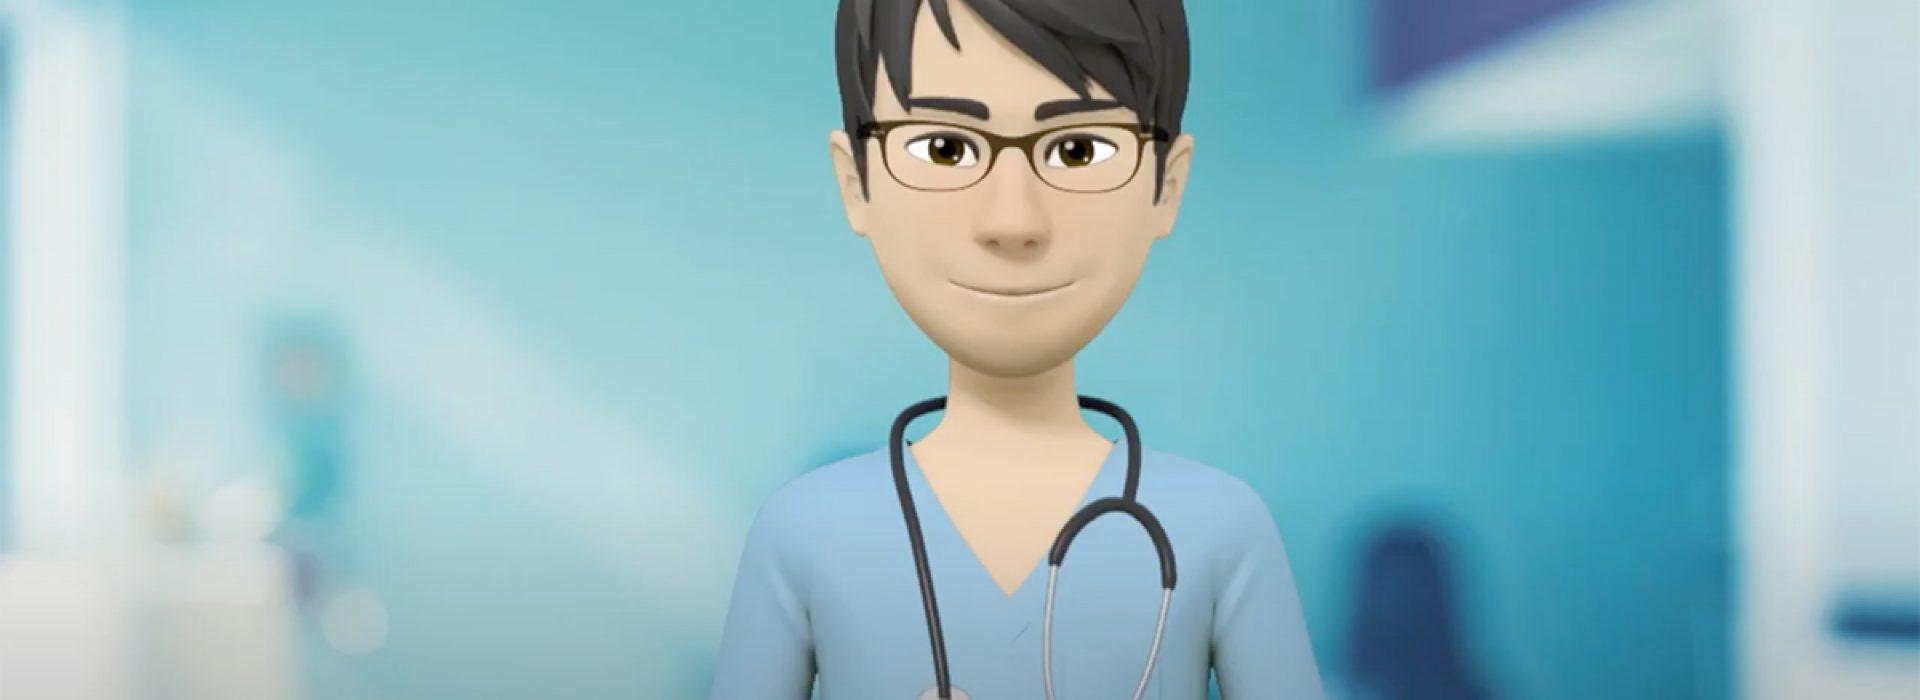 doctor-virtual